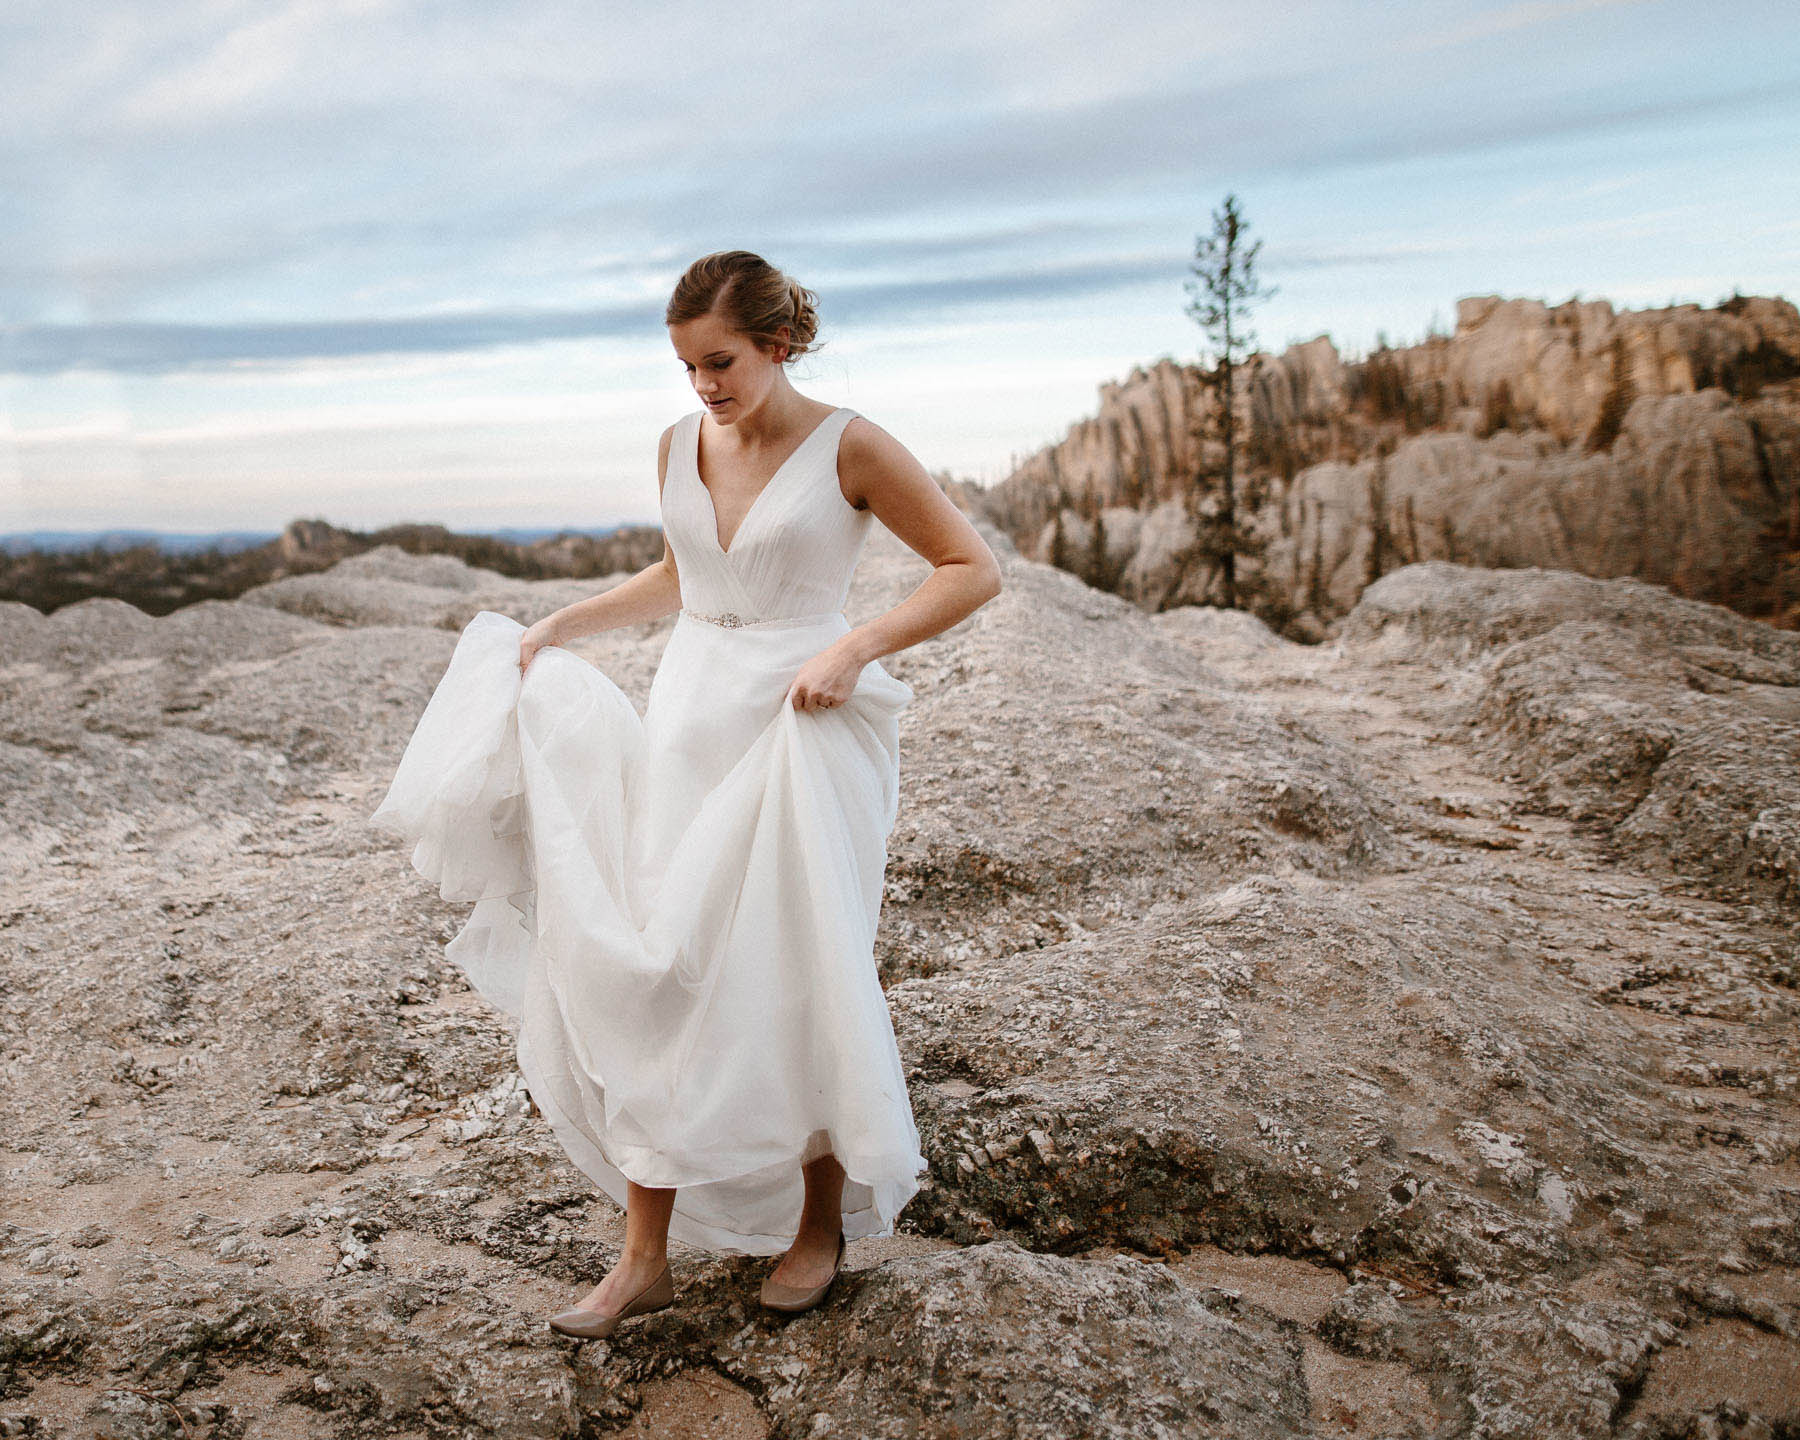 sioux-falls-black-hills-rapid-city-elopement-wedding-adventure-photographer-custer-sylvan-lake-58.jpg